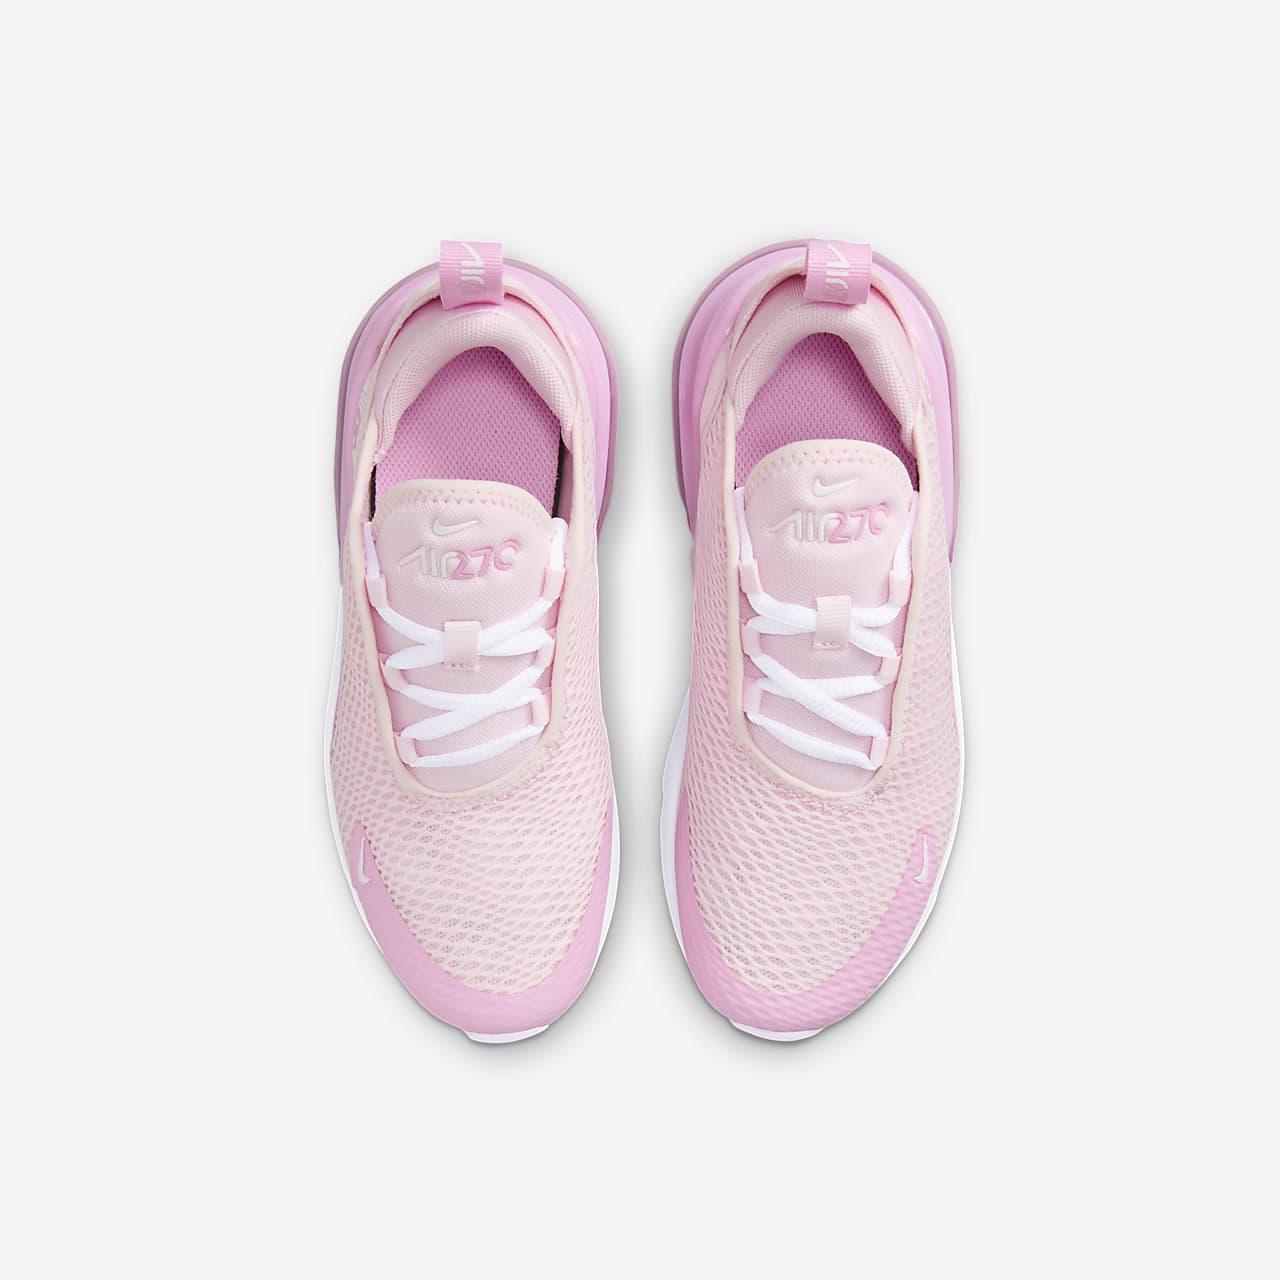 nike air max 270 pink kids- OFF 64